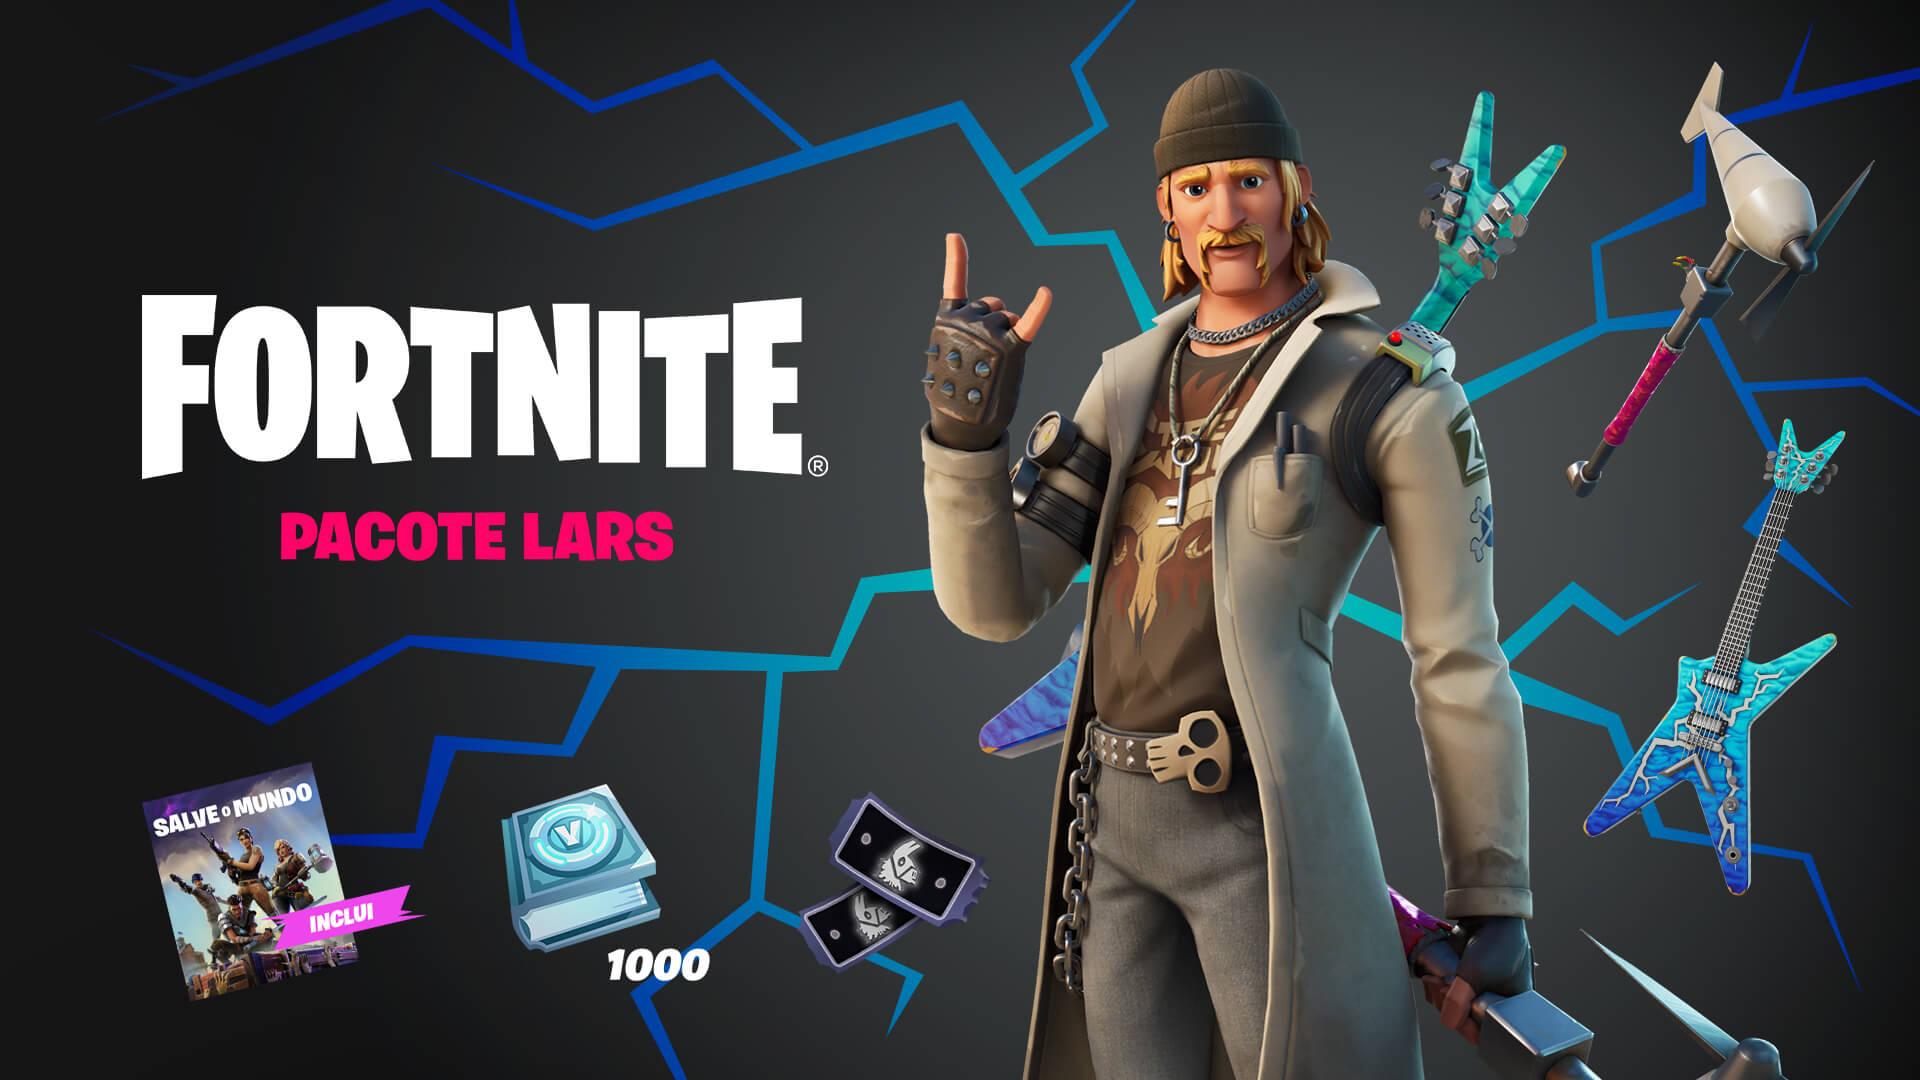 ptbr-fortnite-save-the-world-lars-pack